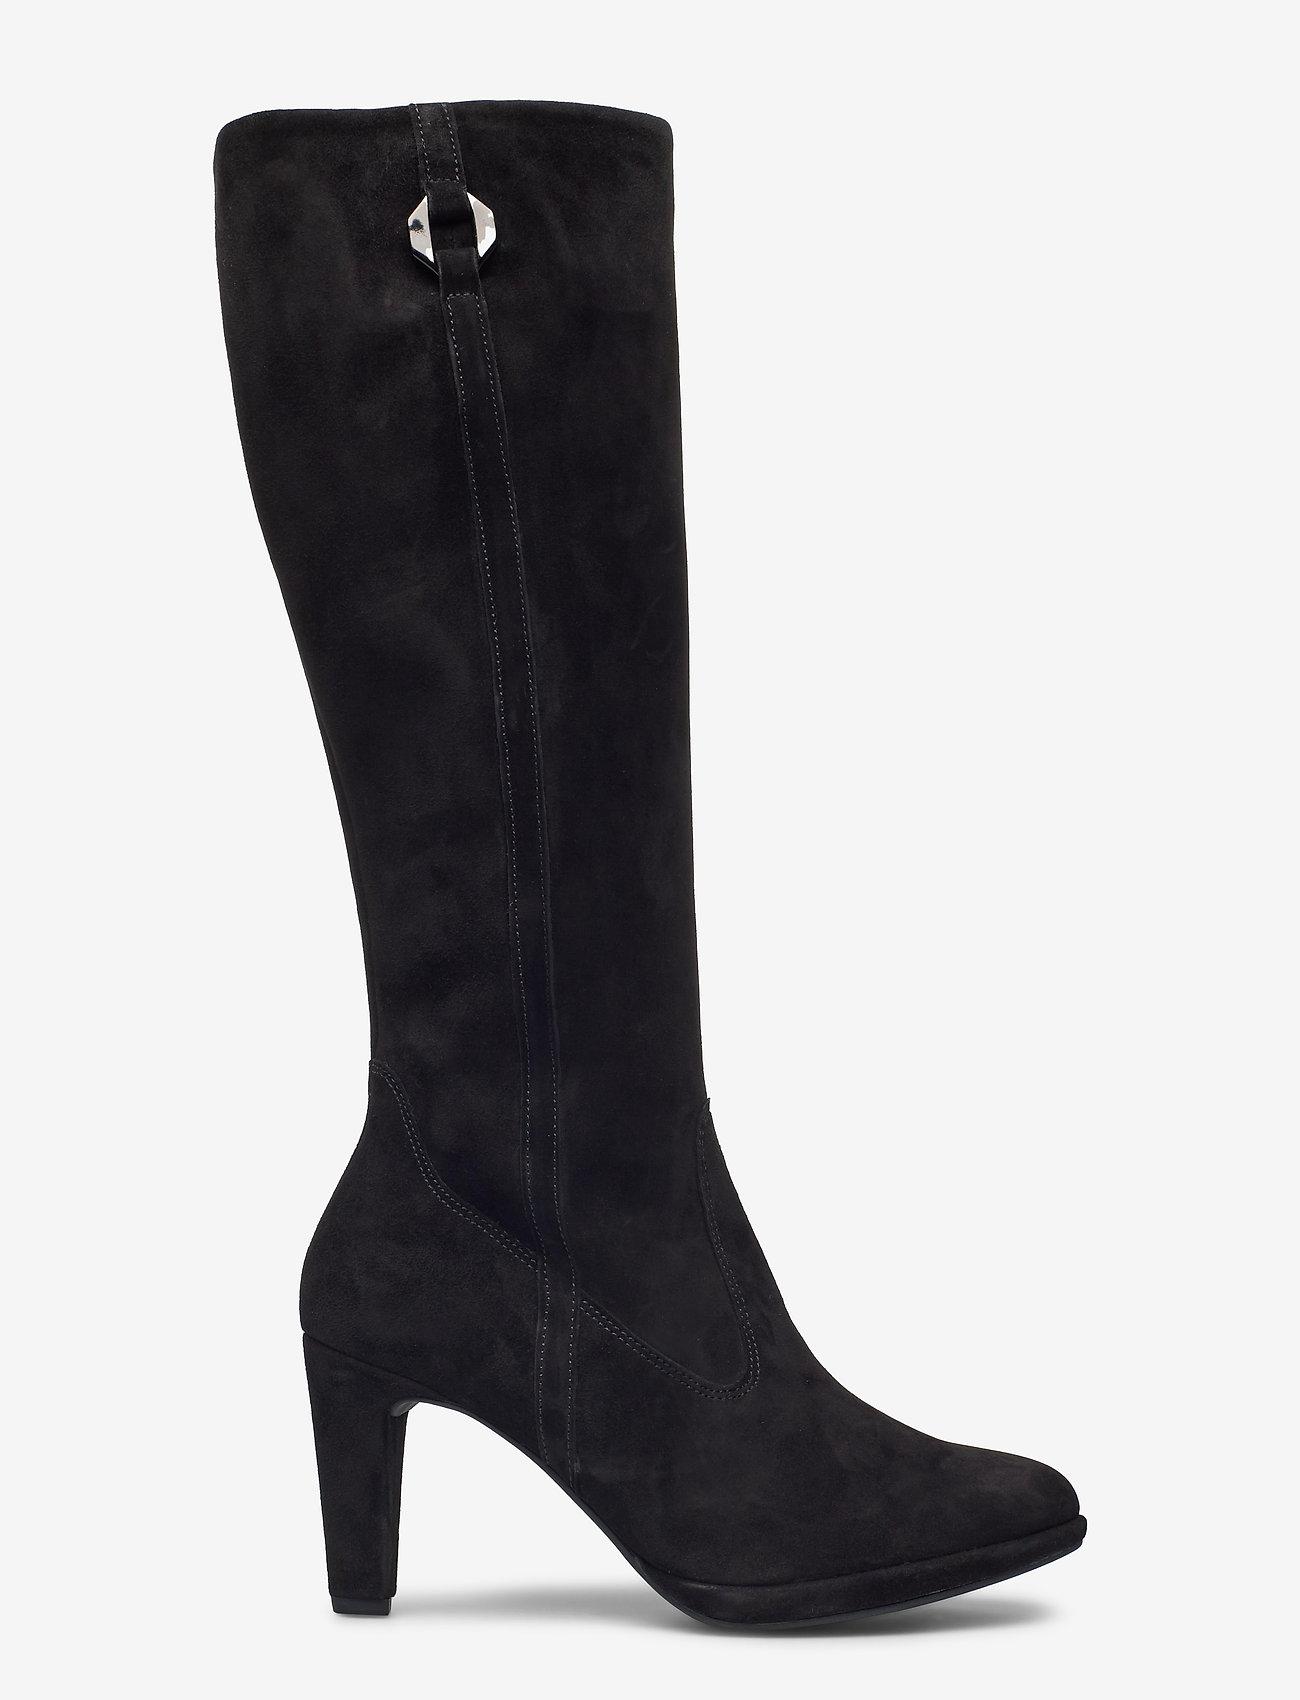 Gabor - Ankle boot - lange laarzen - black - 1